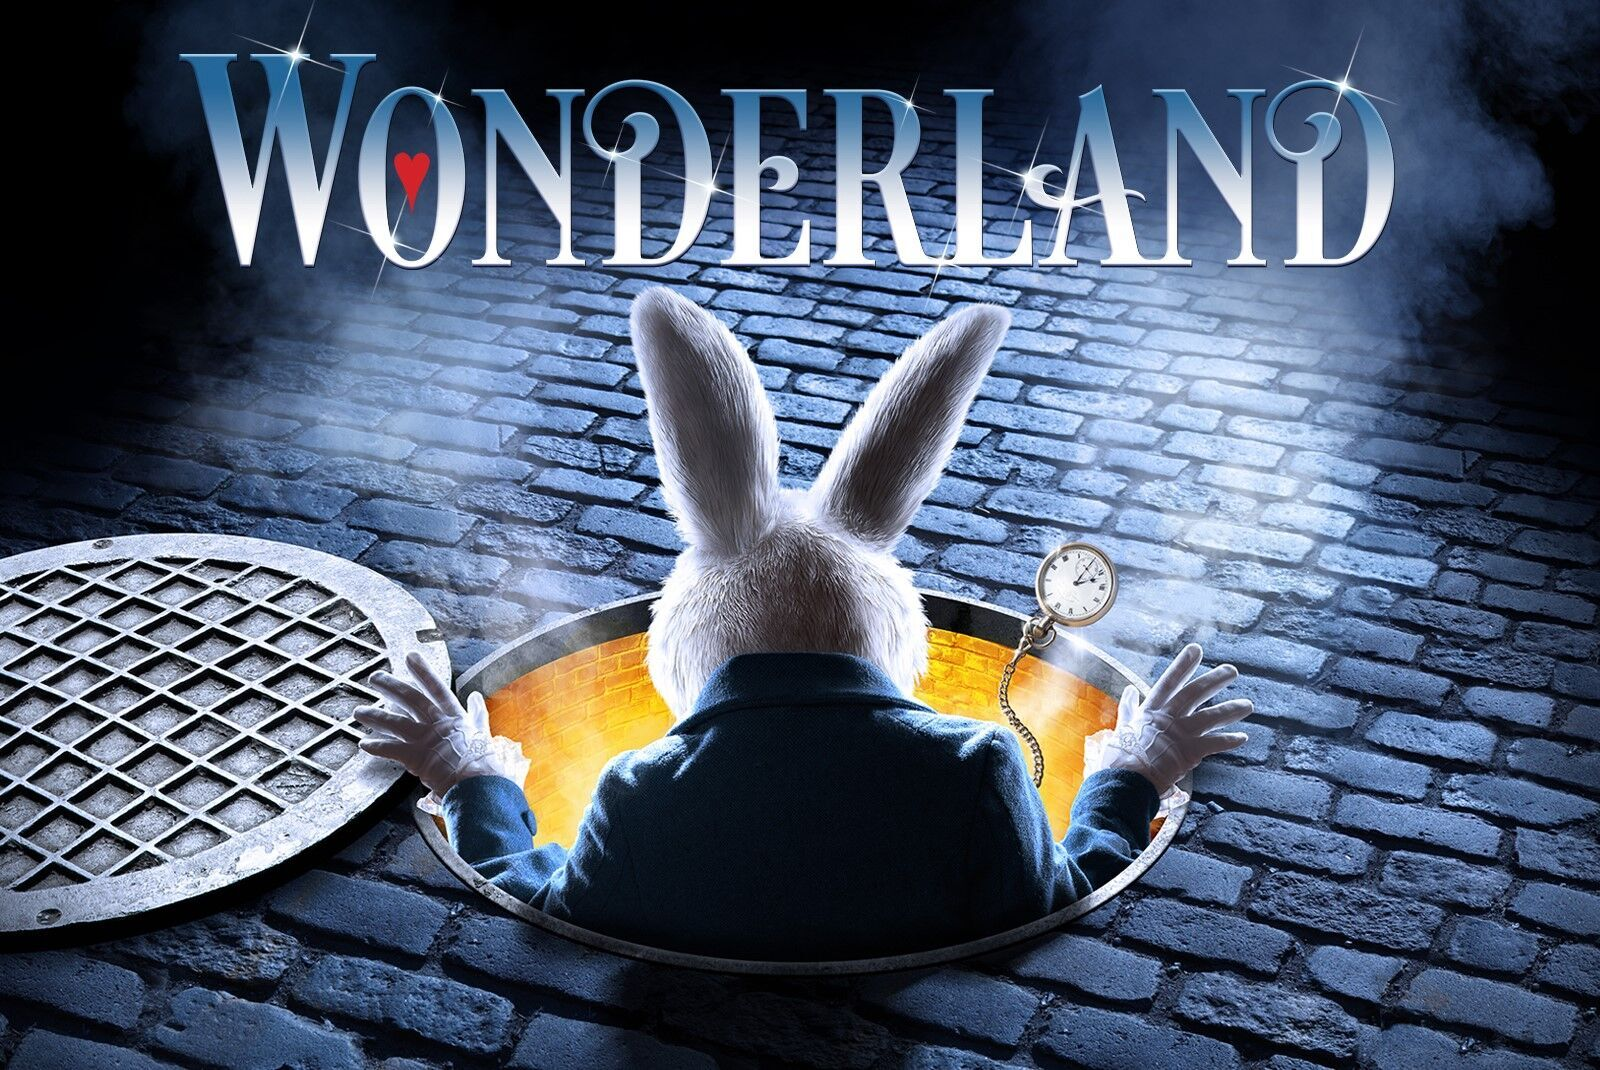 Wonderland at The Mayflower